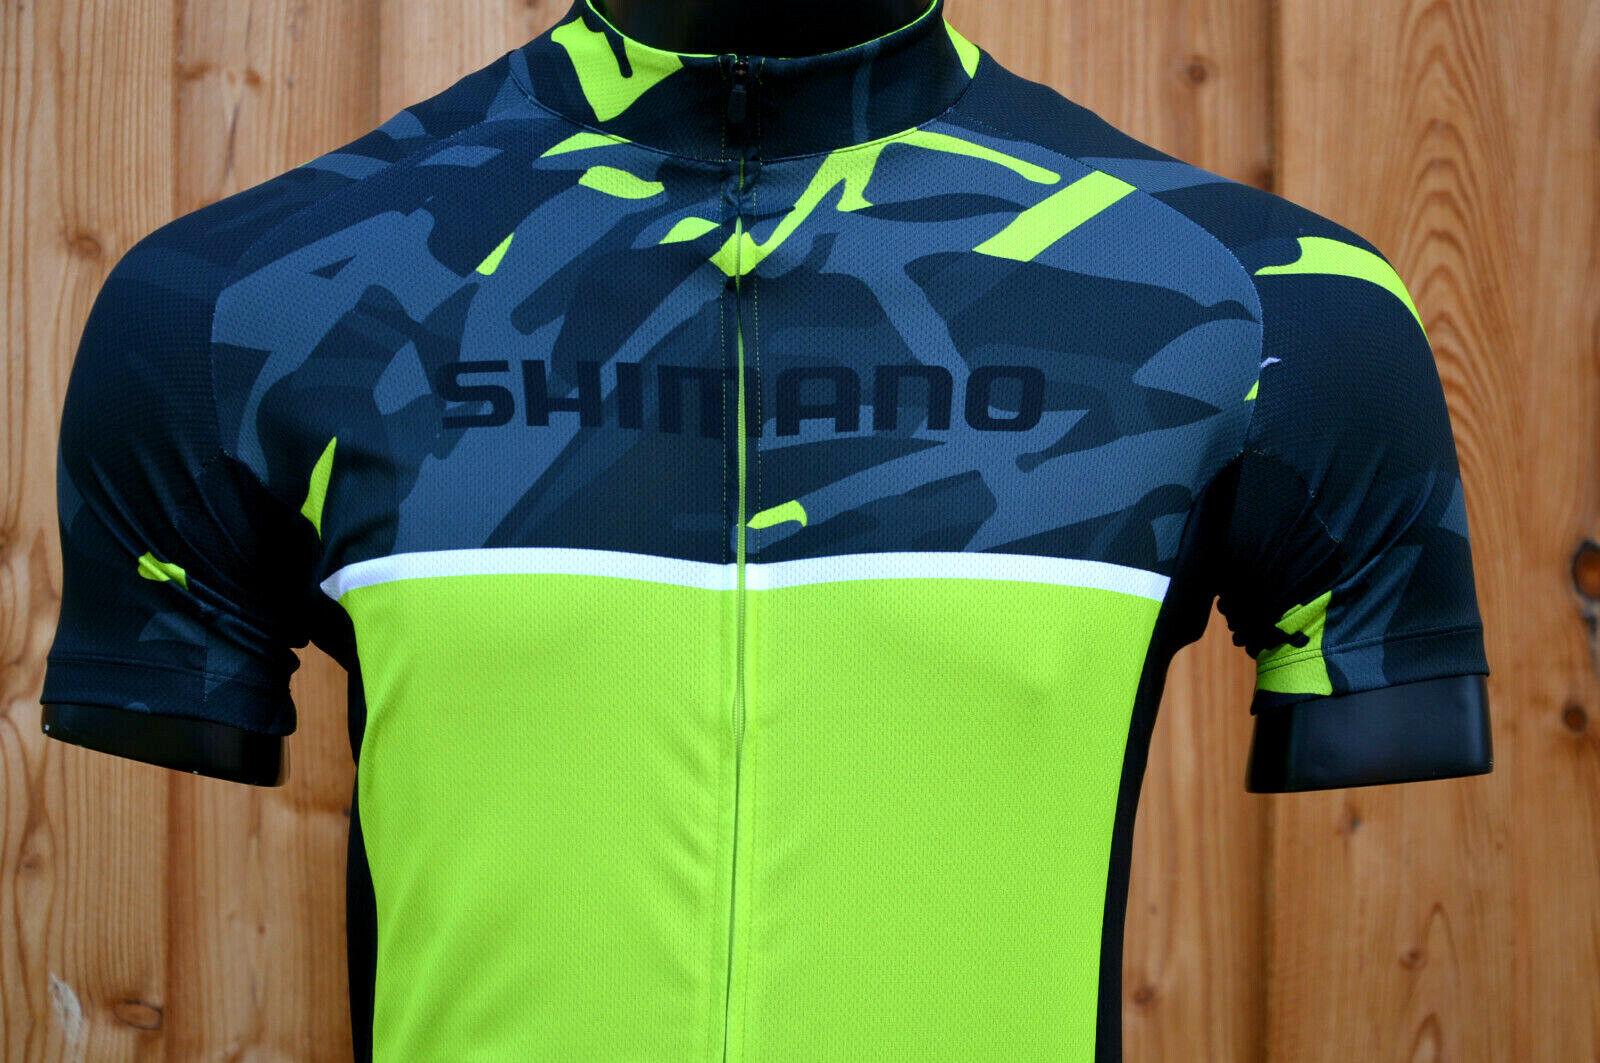 Shiuomoo Squadra Maglia 3 Parleo Prossoezione UV Rapida Essiccazione Gituttio 2019